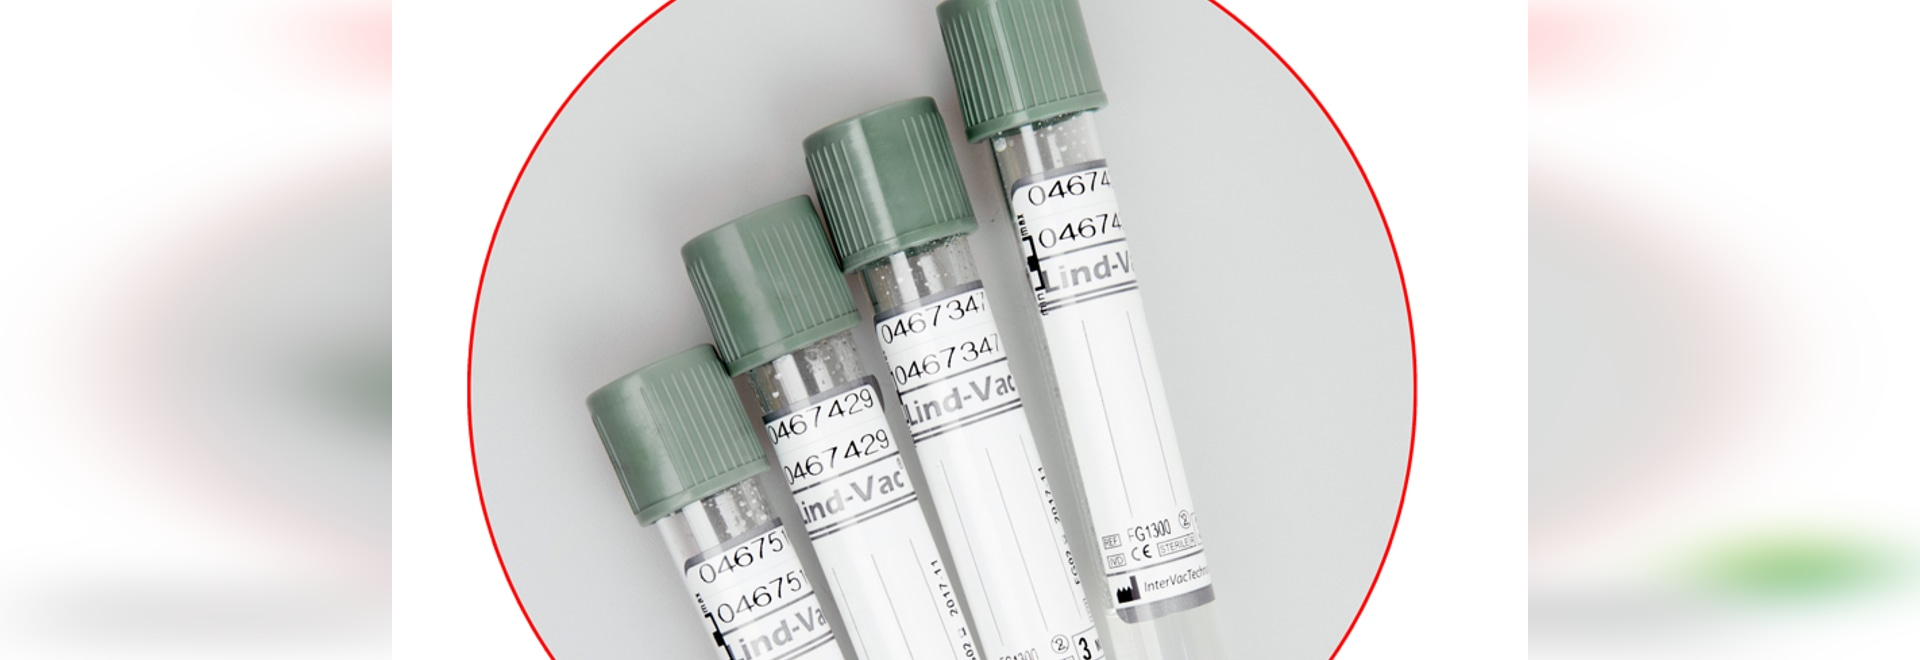 Lind-Vac tube for diabet test